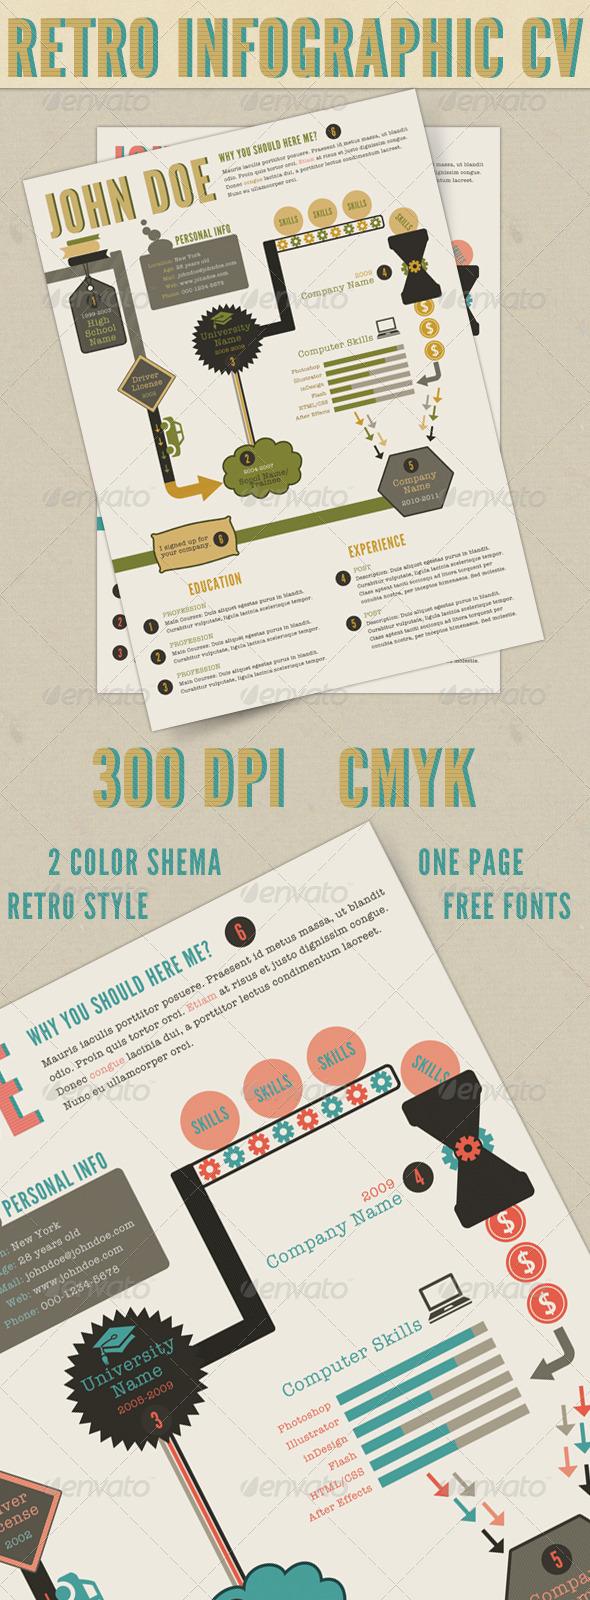 Retro Infographics Resume - http://graphicriver.net/item/retro-infographics-resume/400231?WT.ac=search_thumb&WT.z_author=barpaff